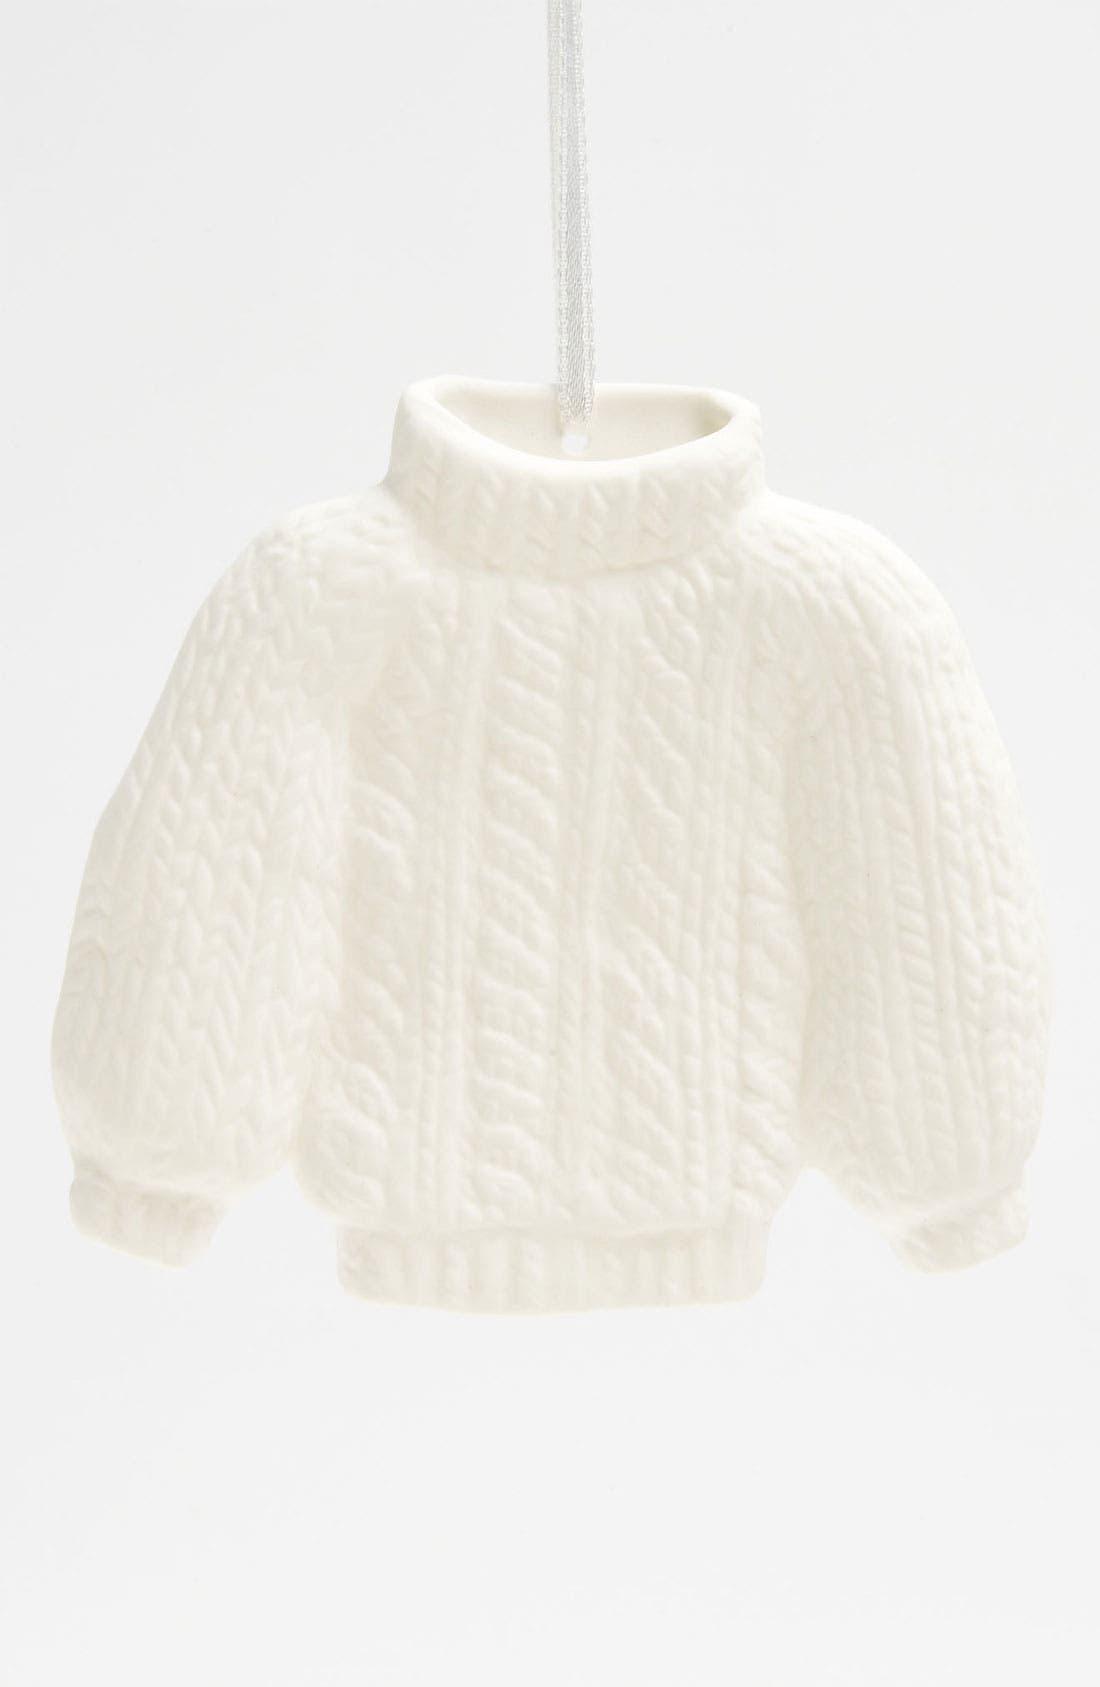 Main Image - CSM Philippines Inc. Sweater Ornament